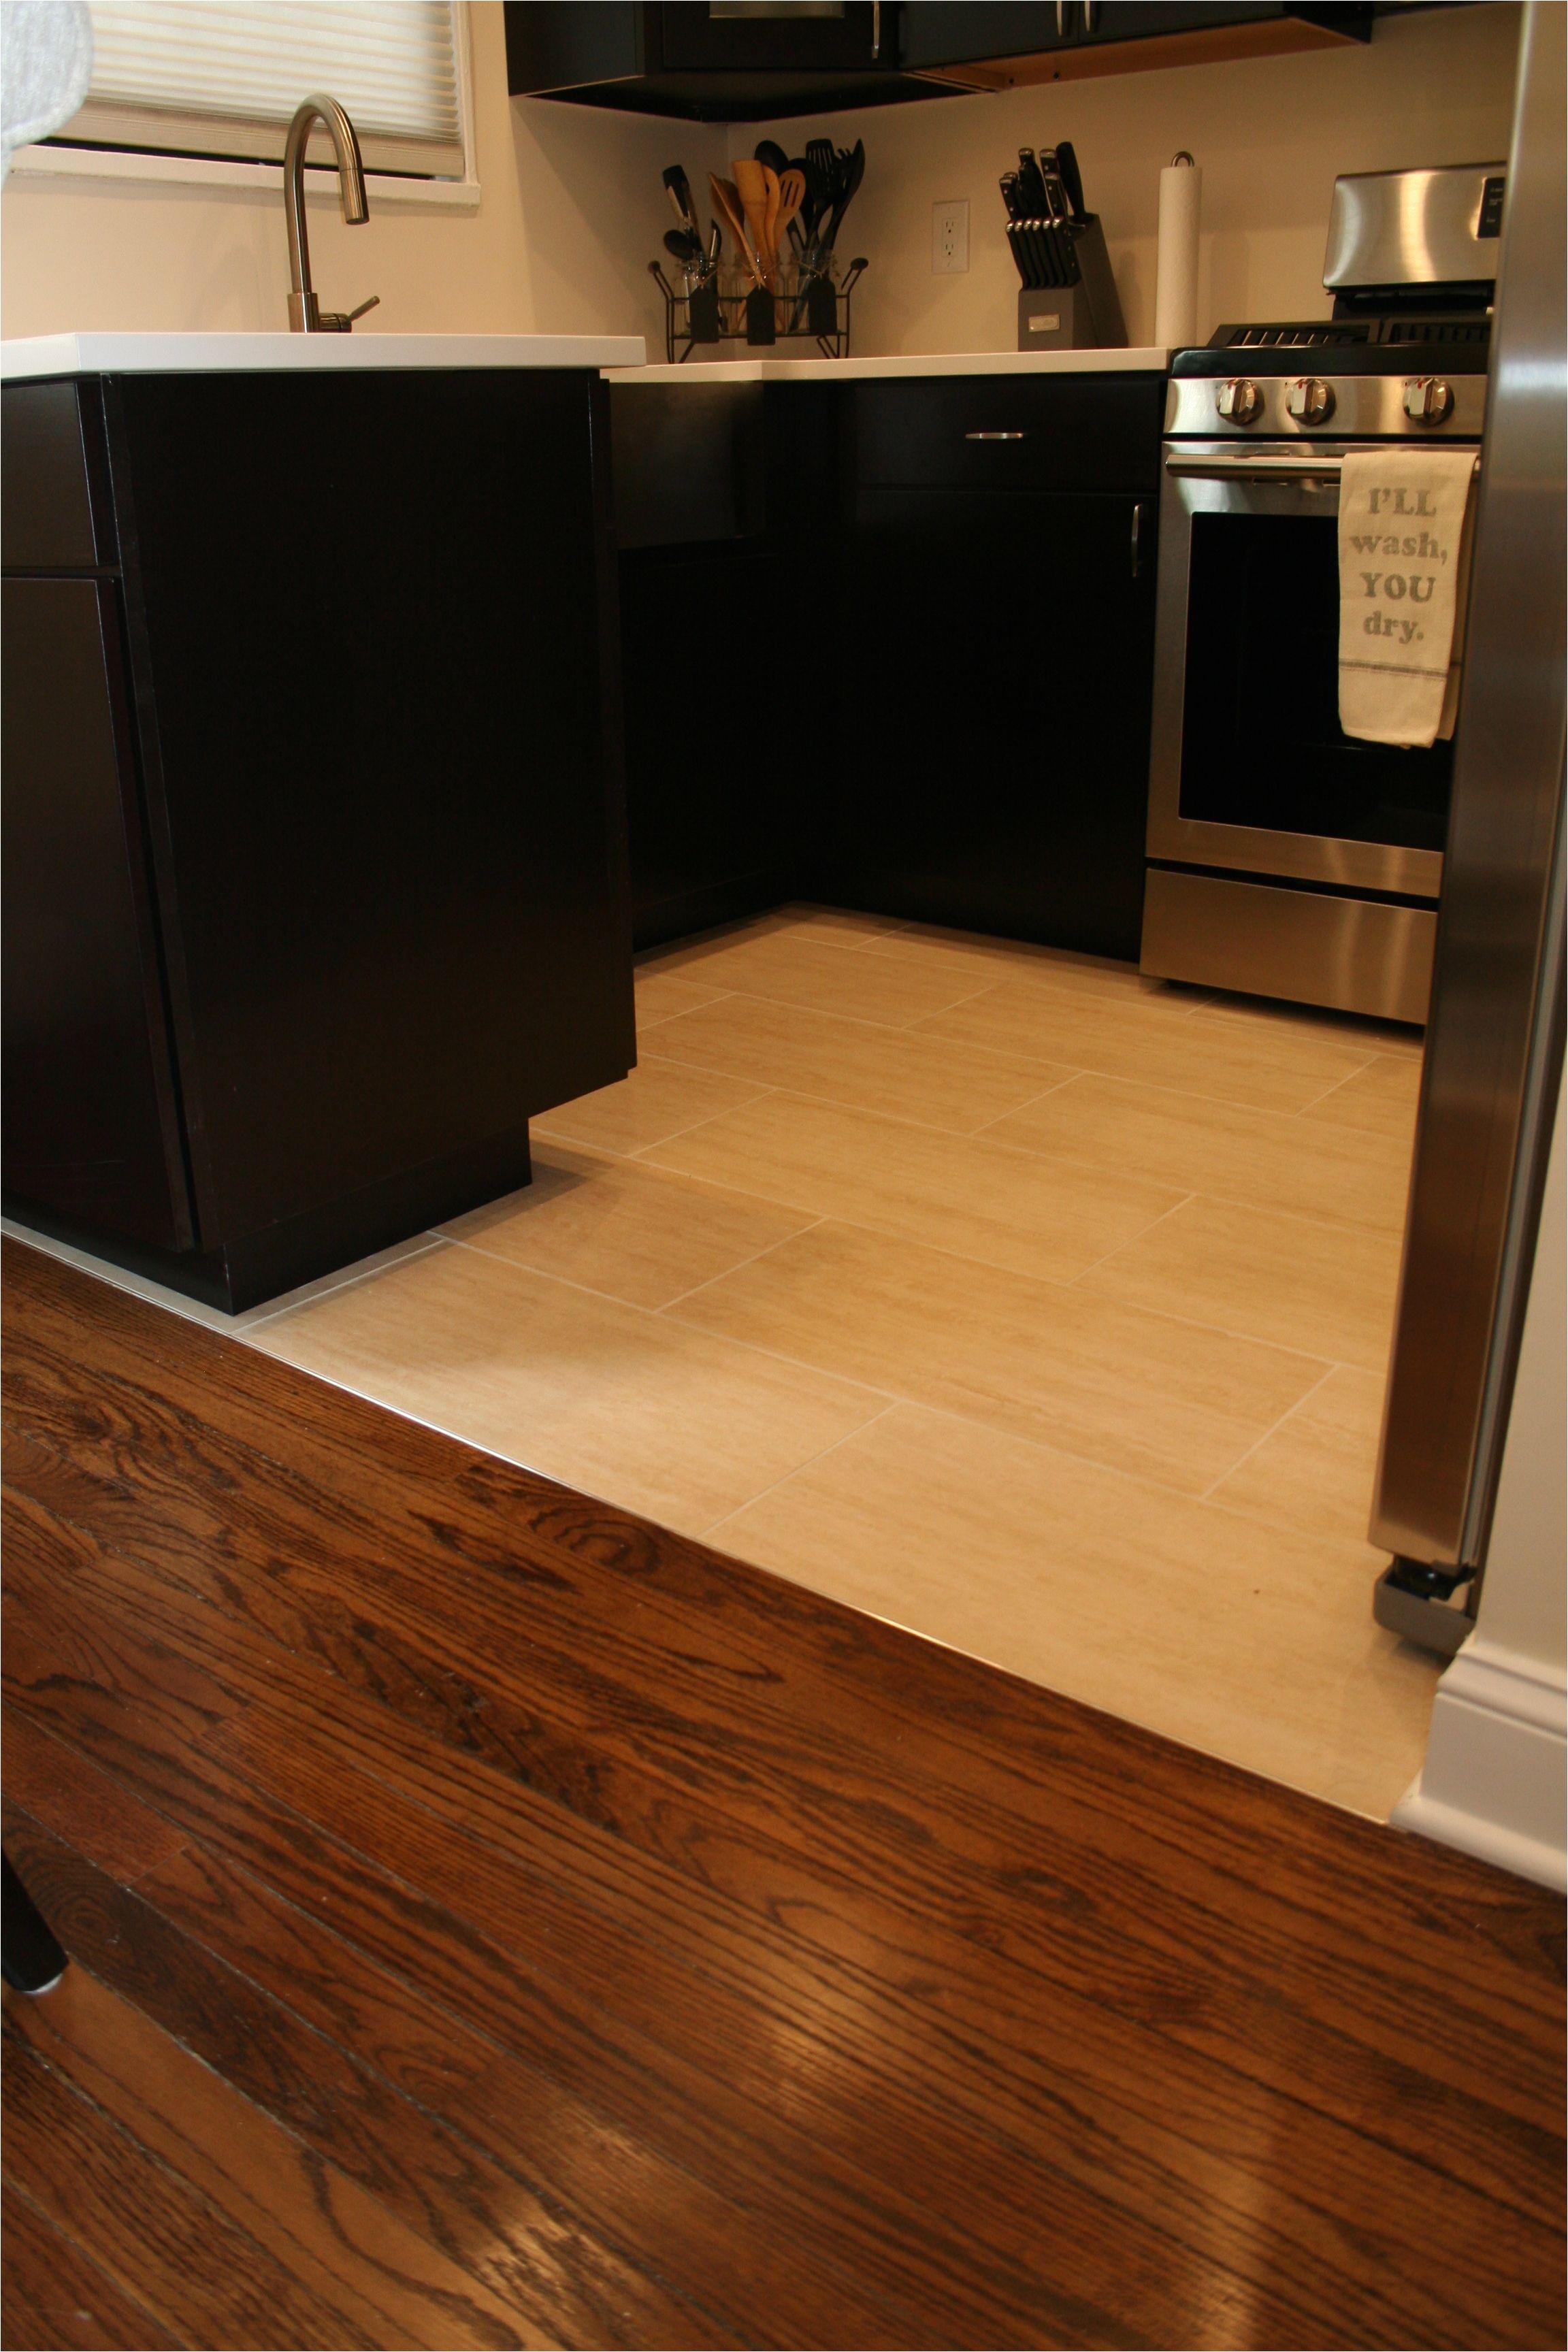 Hardwood Flooring Colorado Springs Transition From Tile to Wood Floors Light to Dark Flooring Http